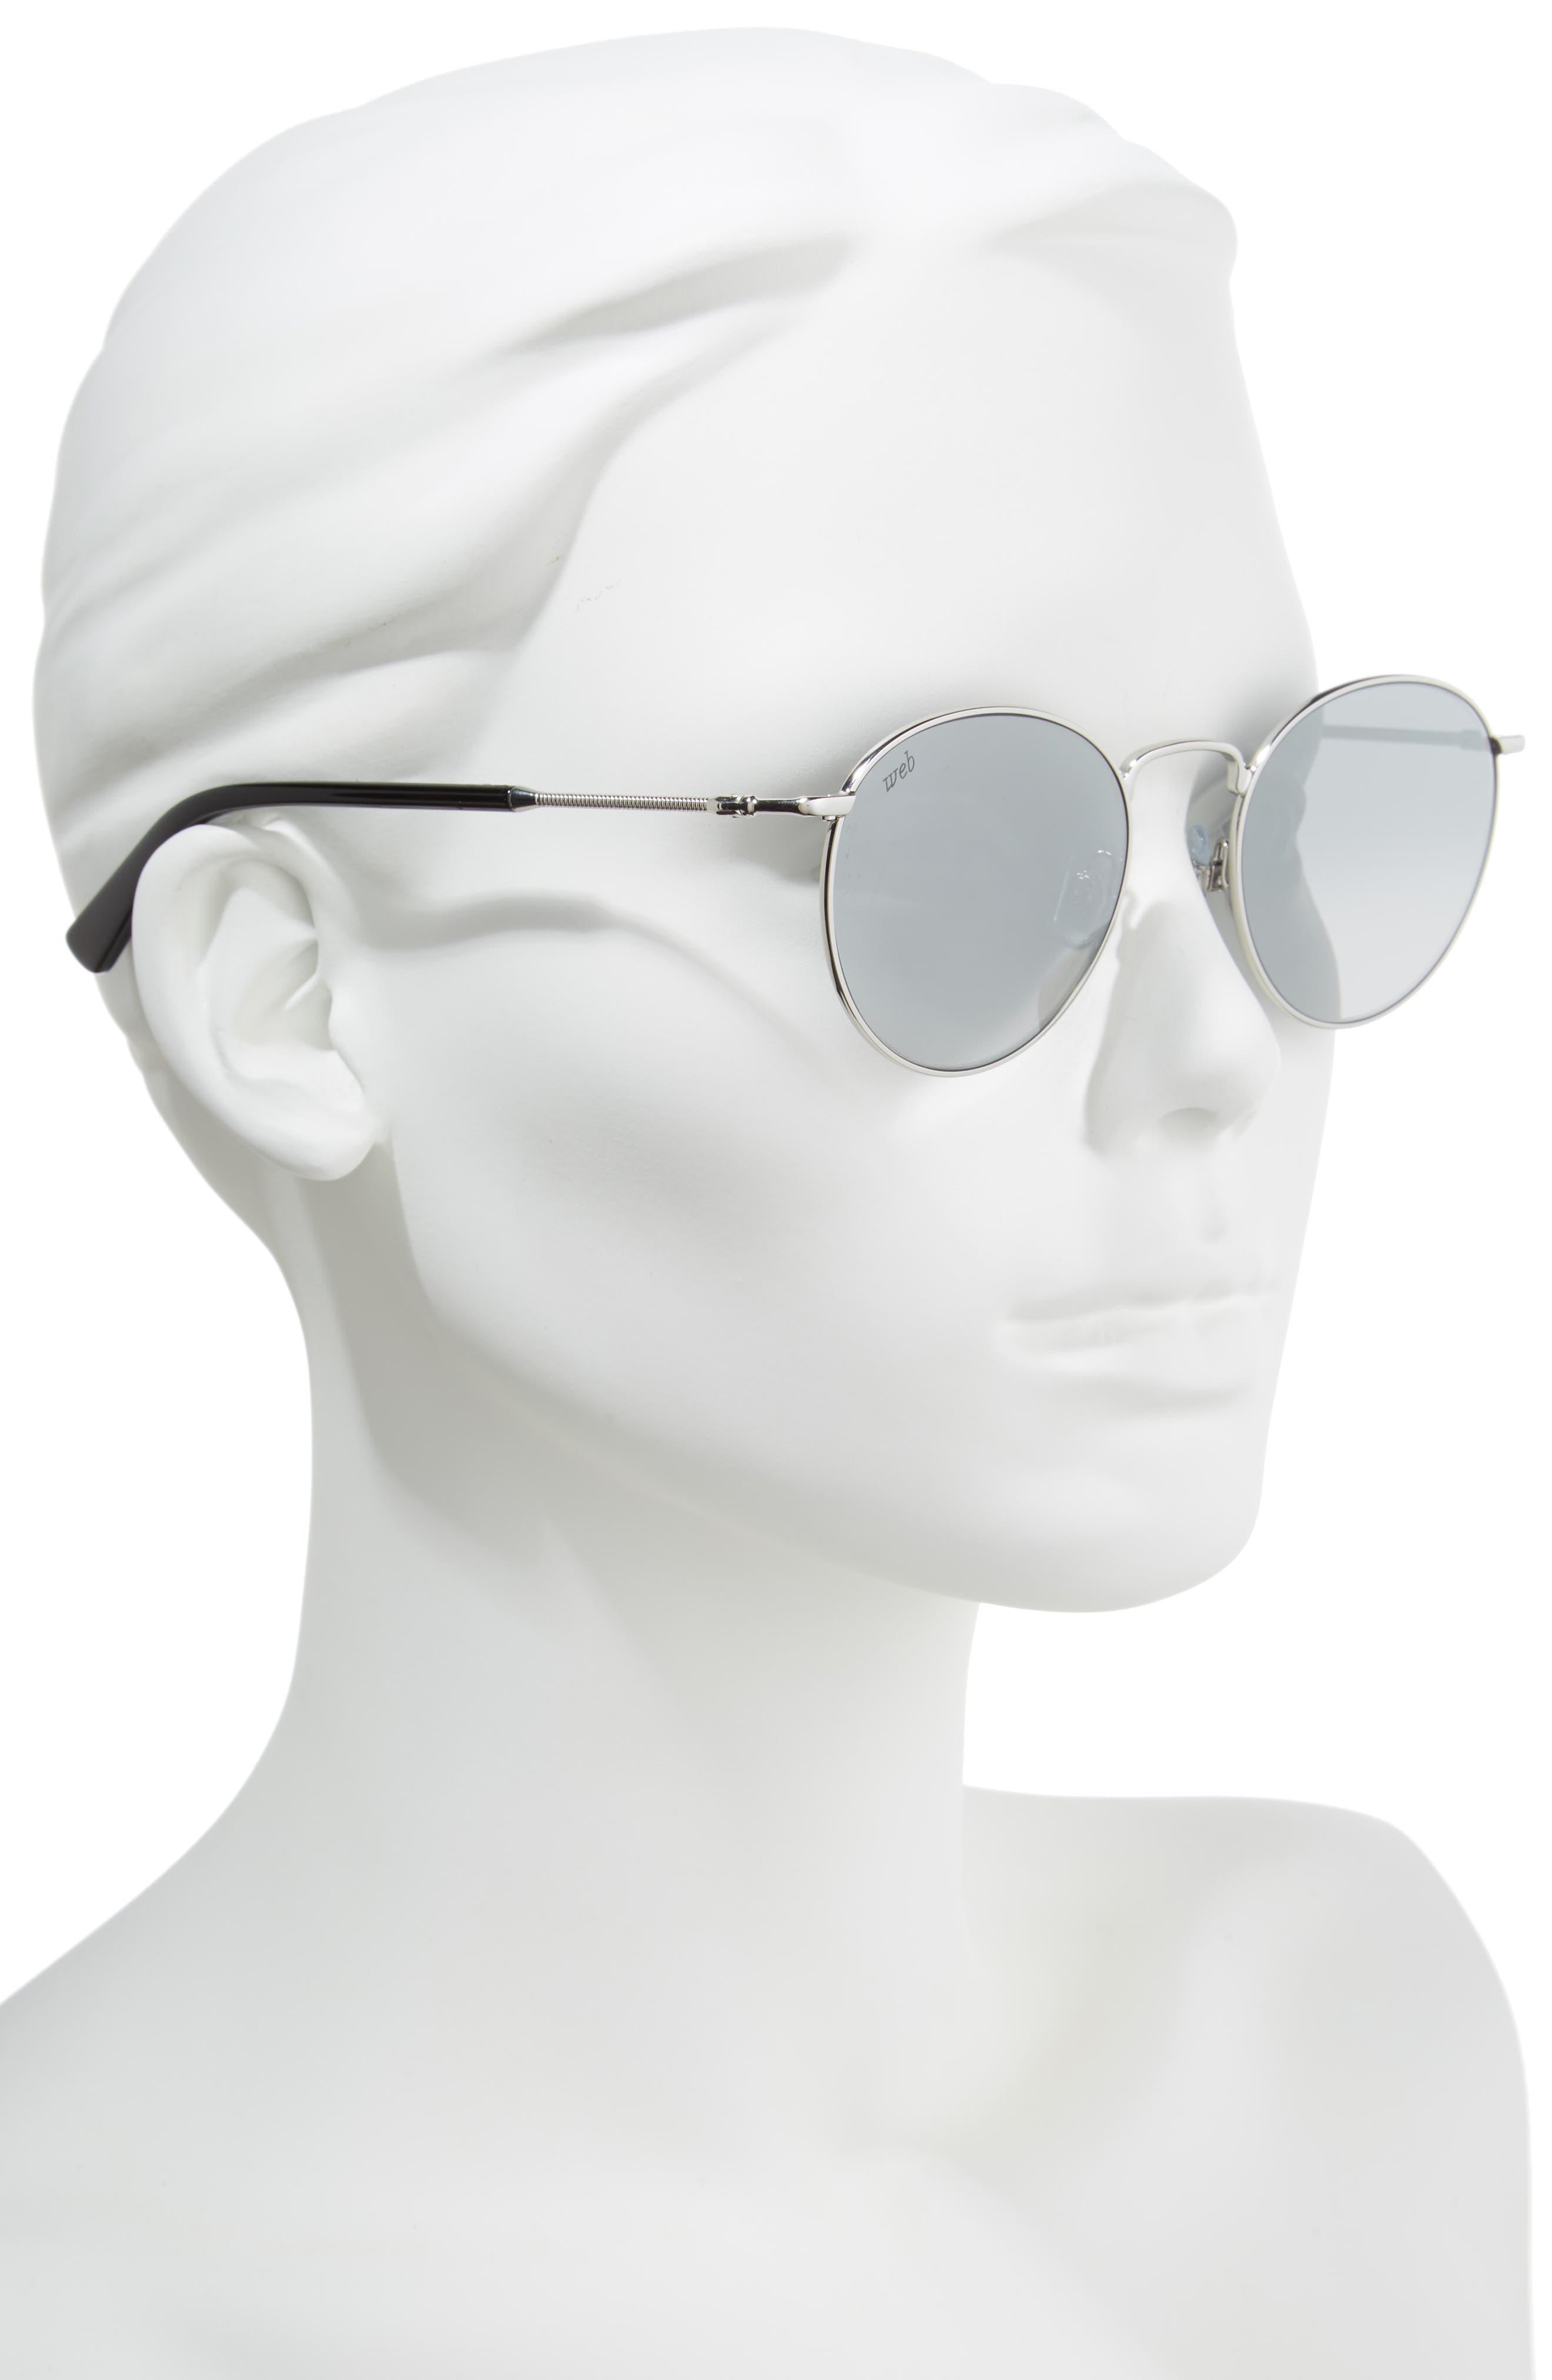 51mm Round Metal Sunglasses,                             Alternate thumbnail 2, color,                             Shiny Palladium/ Smoke Mirror